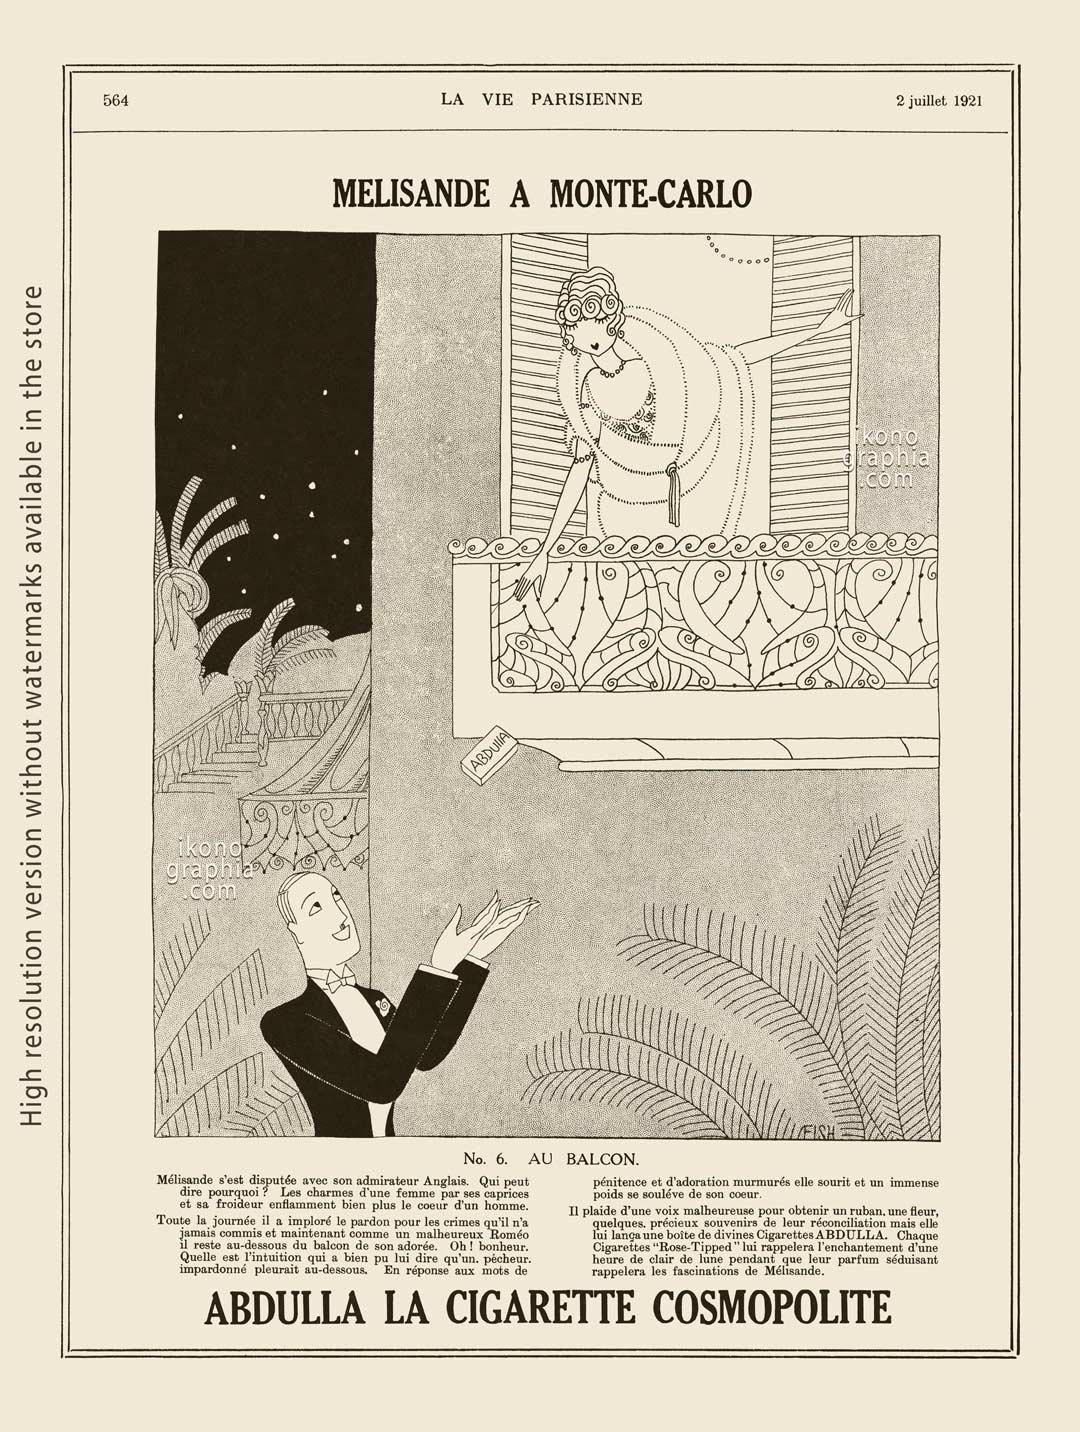 Abdulla Cigarettes Ad - Melisande at Montecarlo. No. 6. AU BALCON / AT THE BALCONY. La Vie Parisienne. July 2, 1921. Artwork by Anne Harriet Fish.